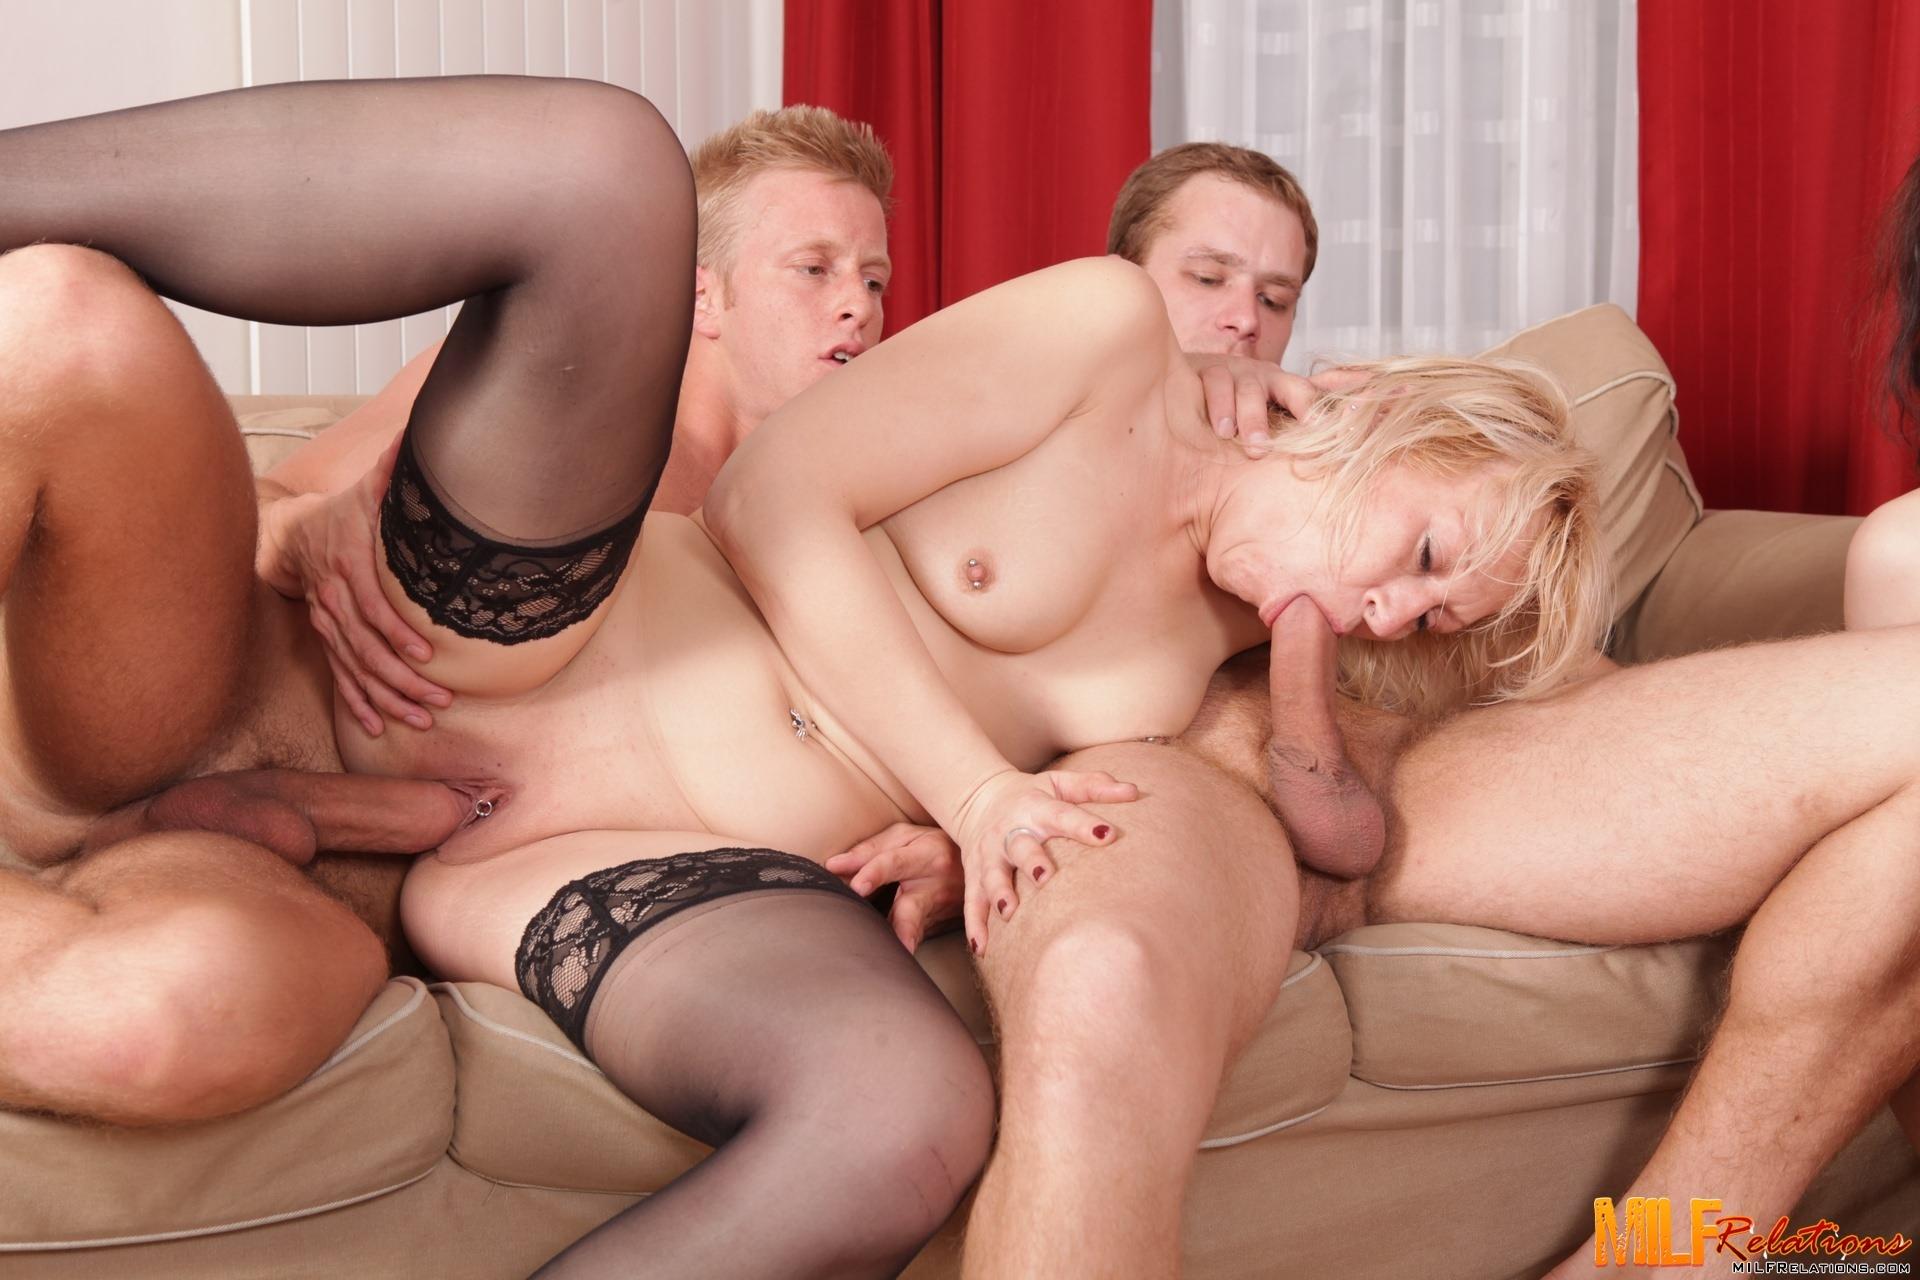 Those mature milf orgy galleries